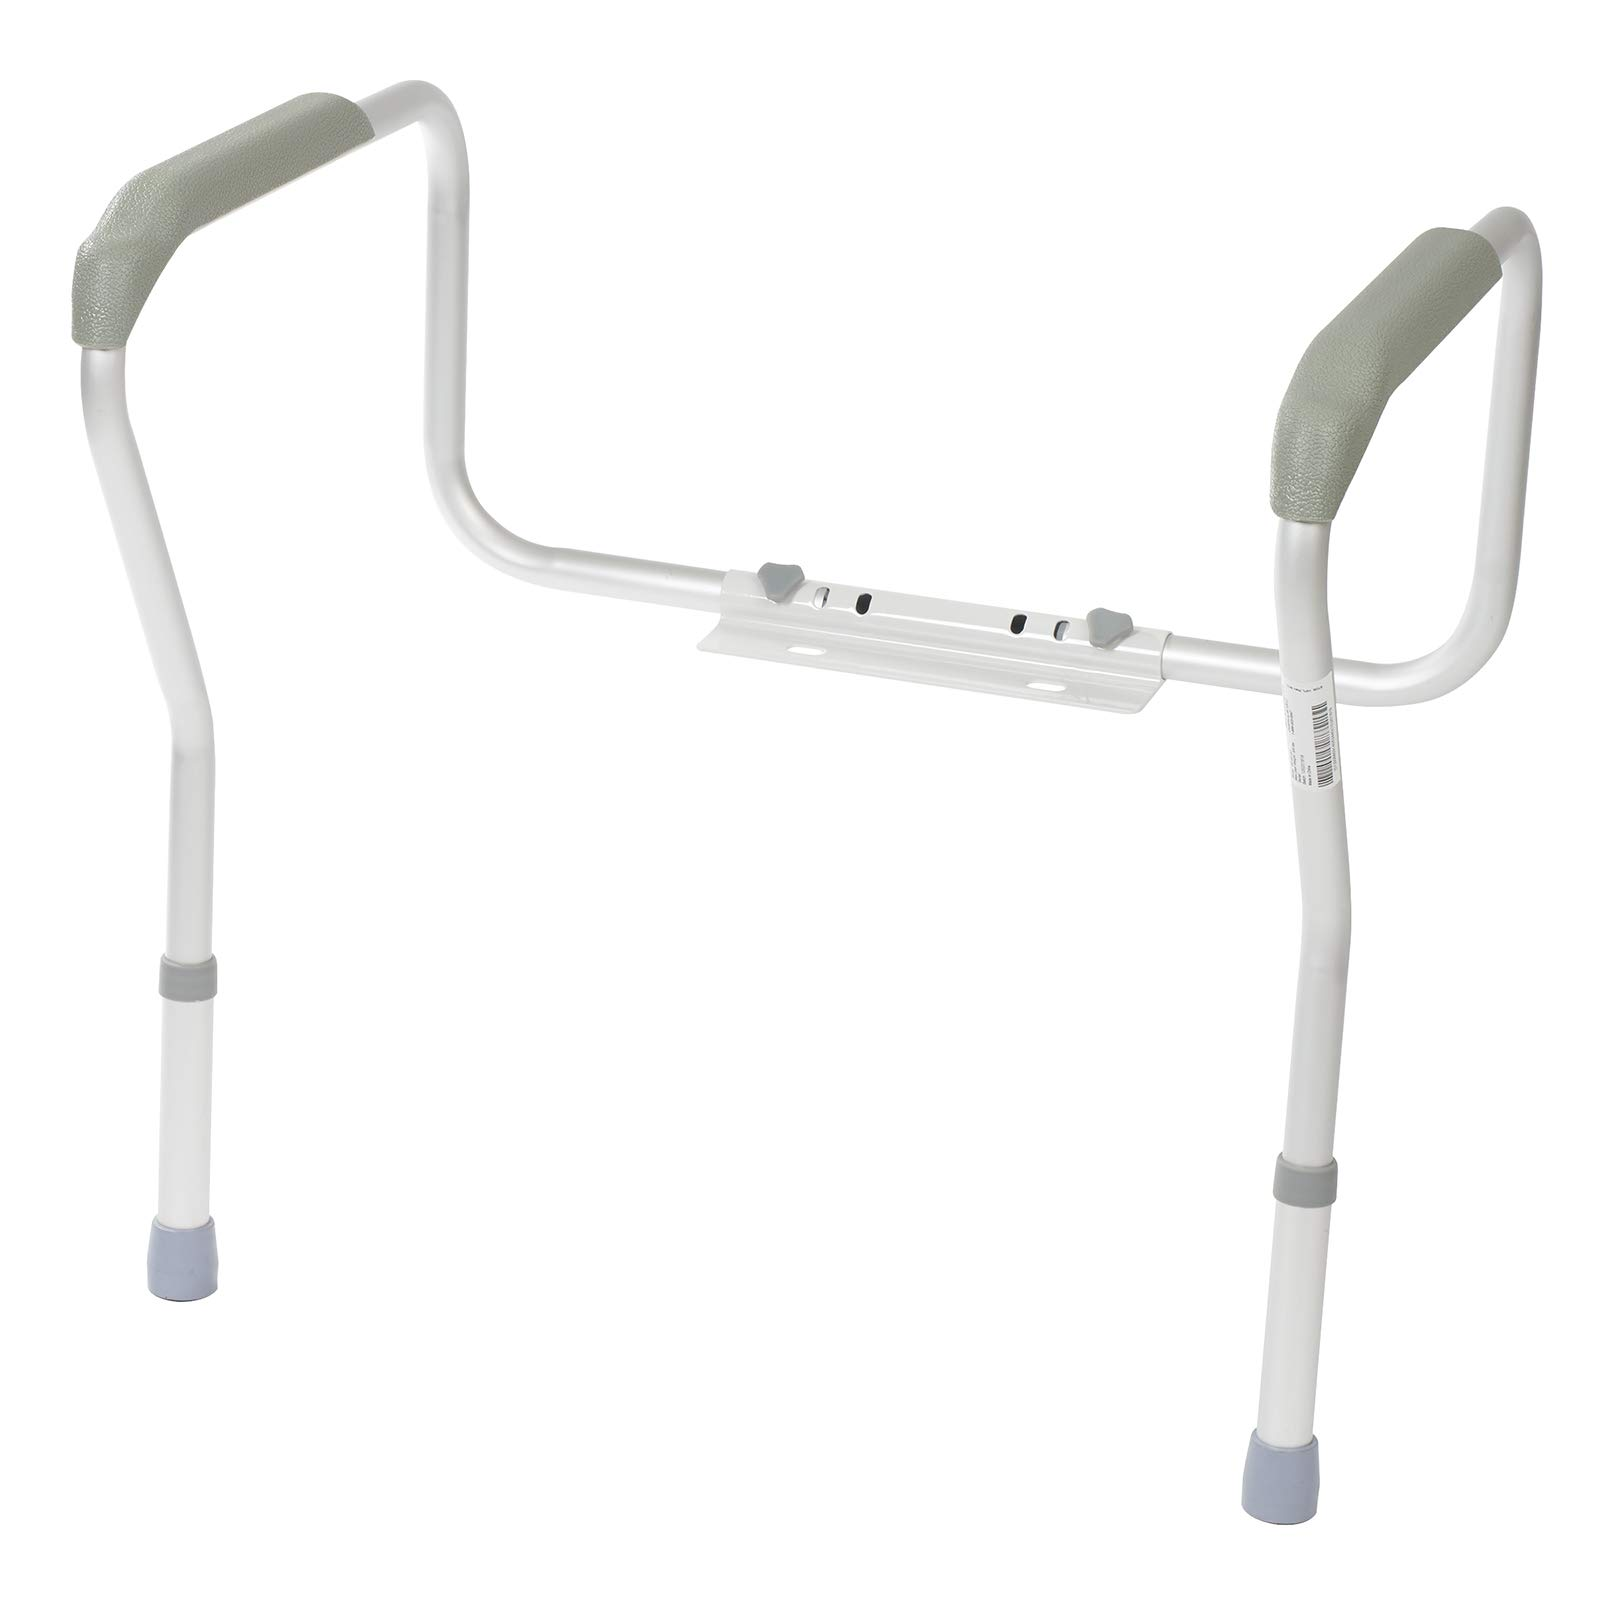 Homecraft Toilet Safety Frame, Bathroom Toilet Frame for Handicap or Disabled, Assistance Rails for Elderly, Adjustable Toilet Hand Rails for Support, Safety, and Comfort, Bathroom Grab Bar by Homecraft